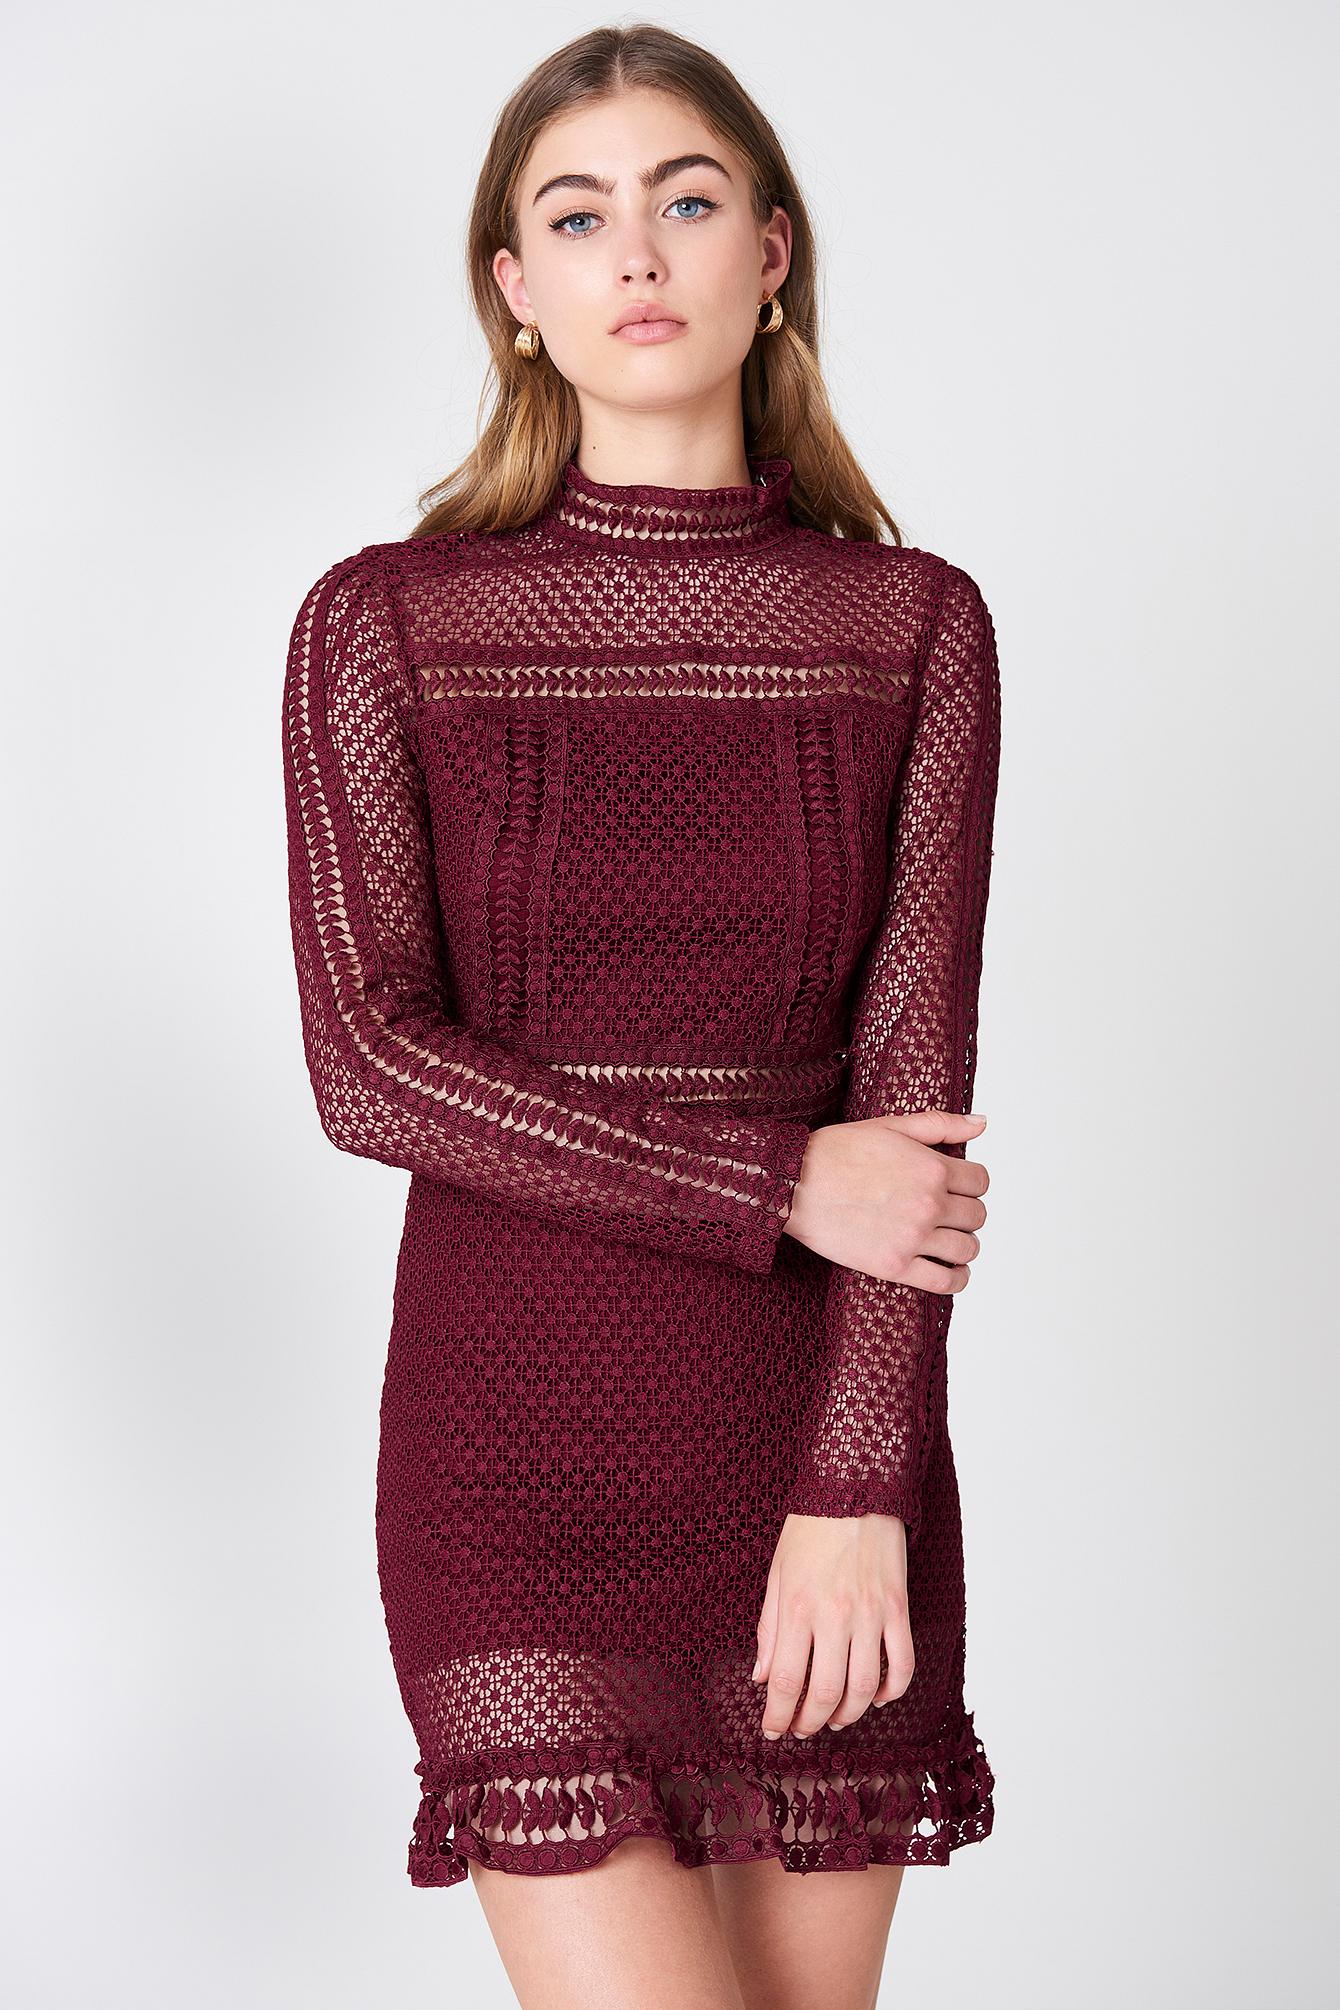 TIFFANY LACE DRESS - RED